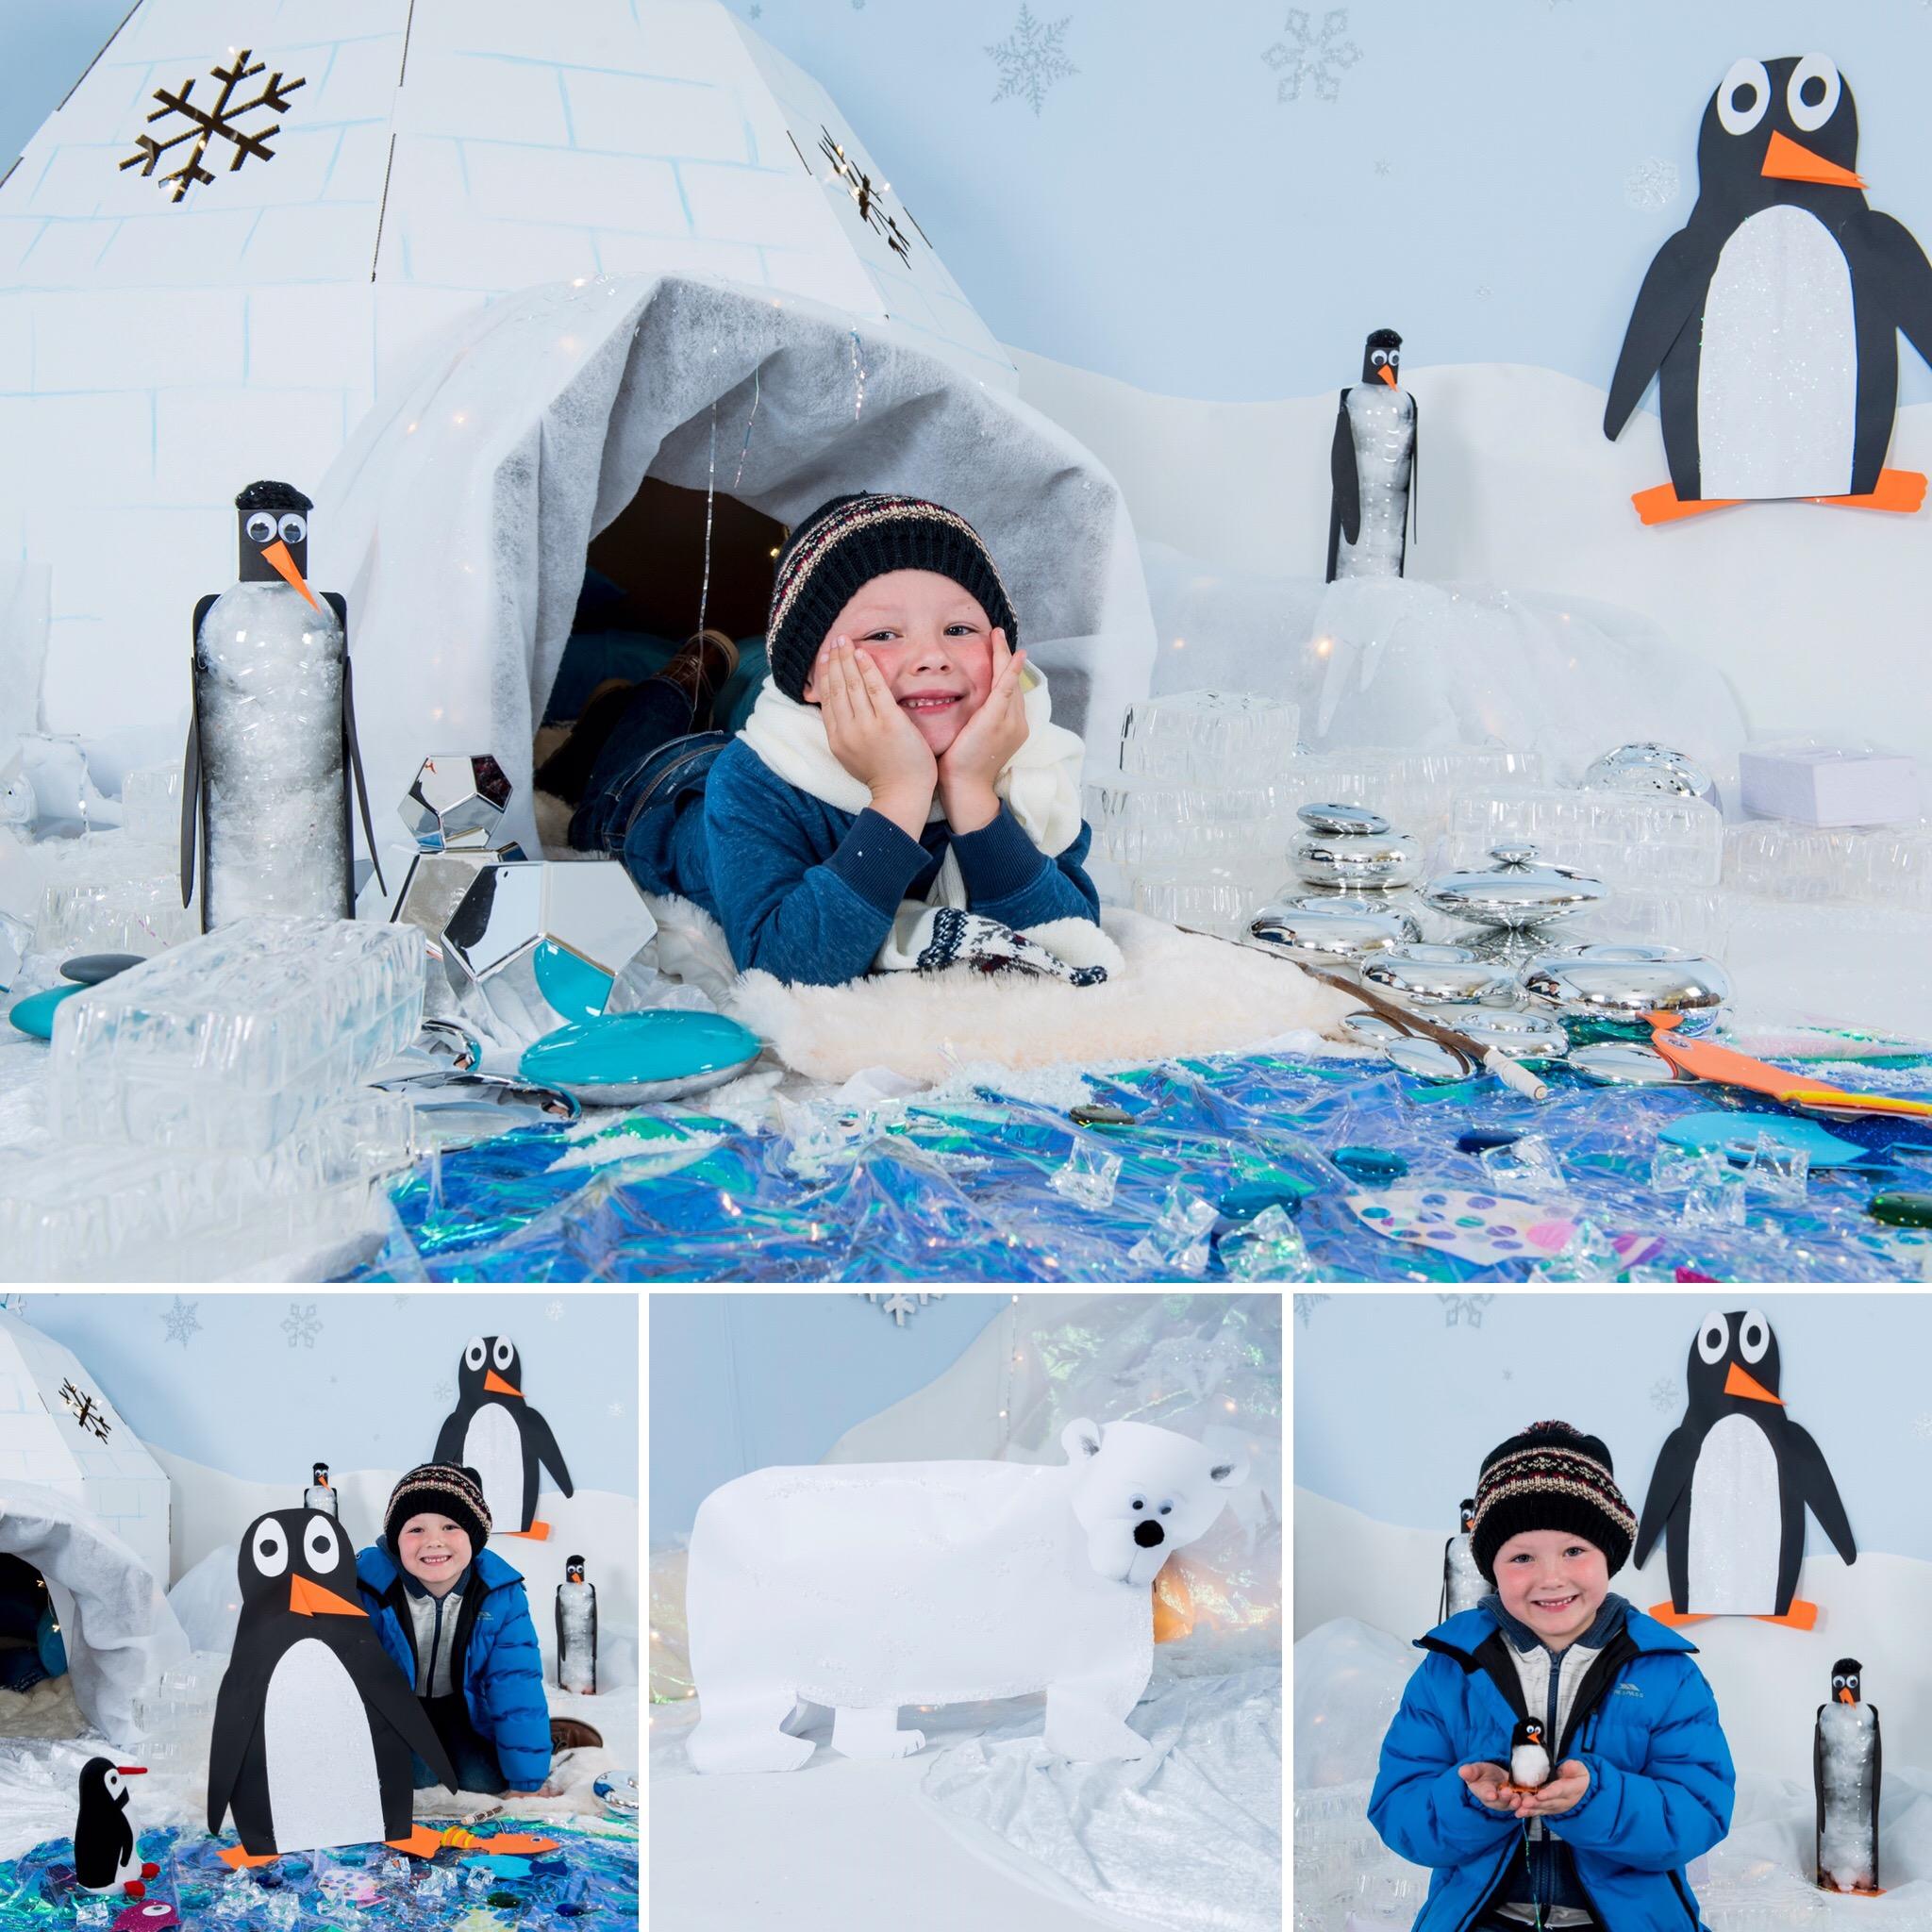 arctic igloo scene